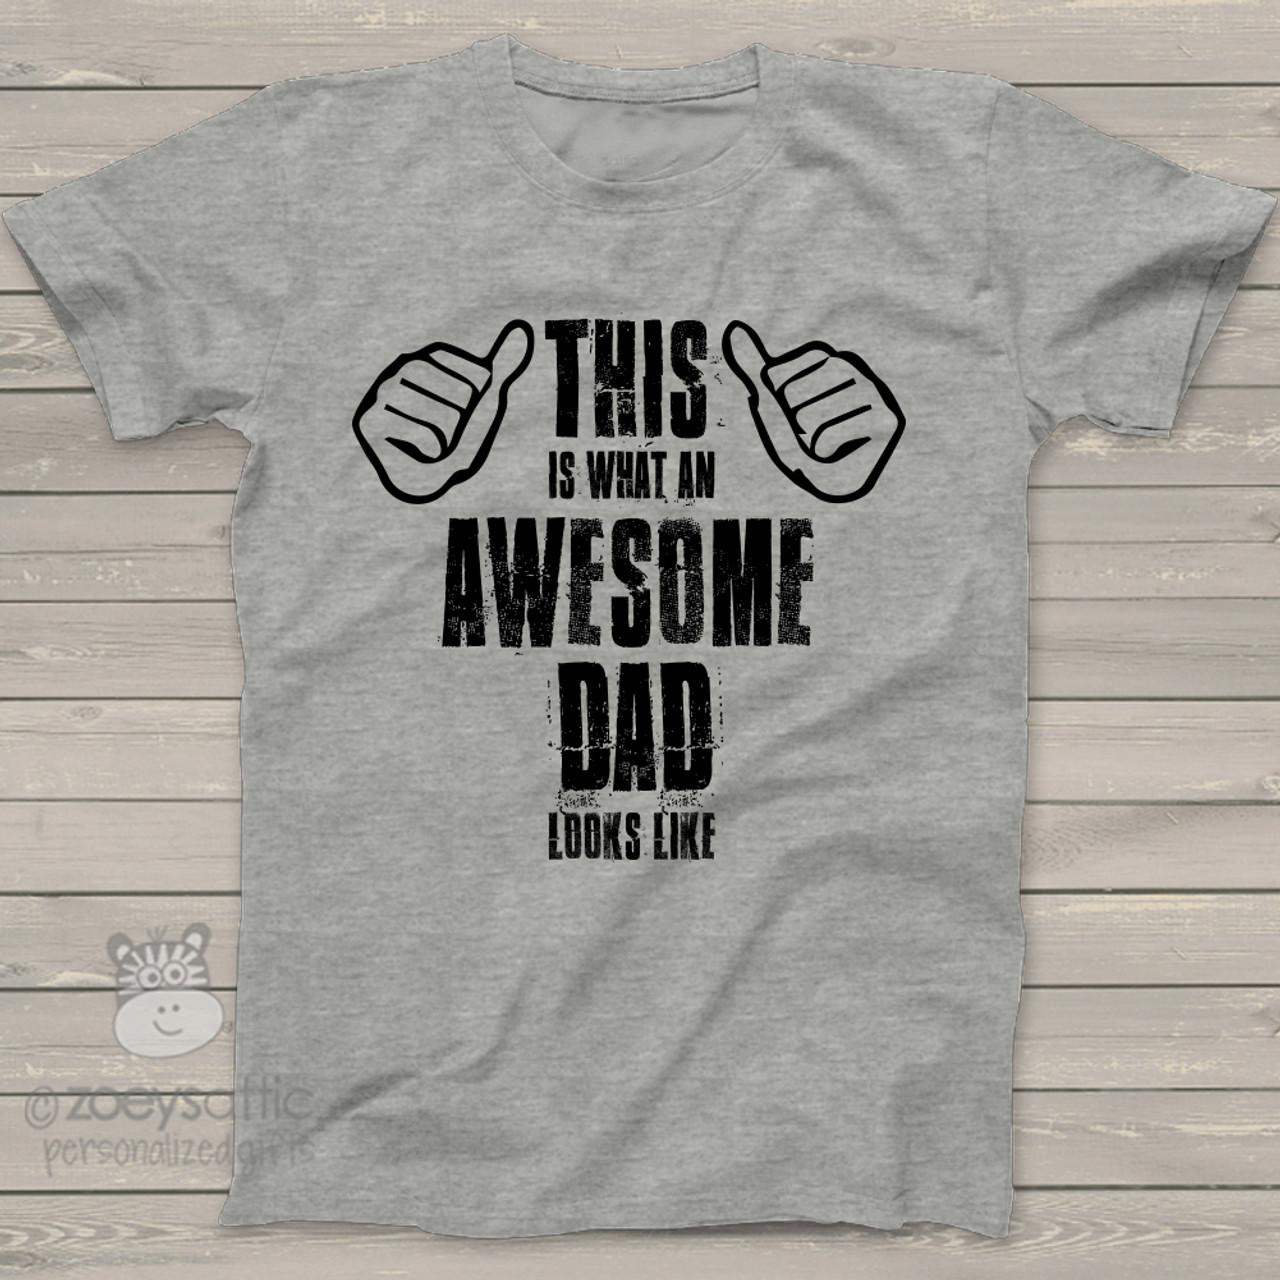 ca486497 fathers day shirt, awesome dad custom tshirt